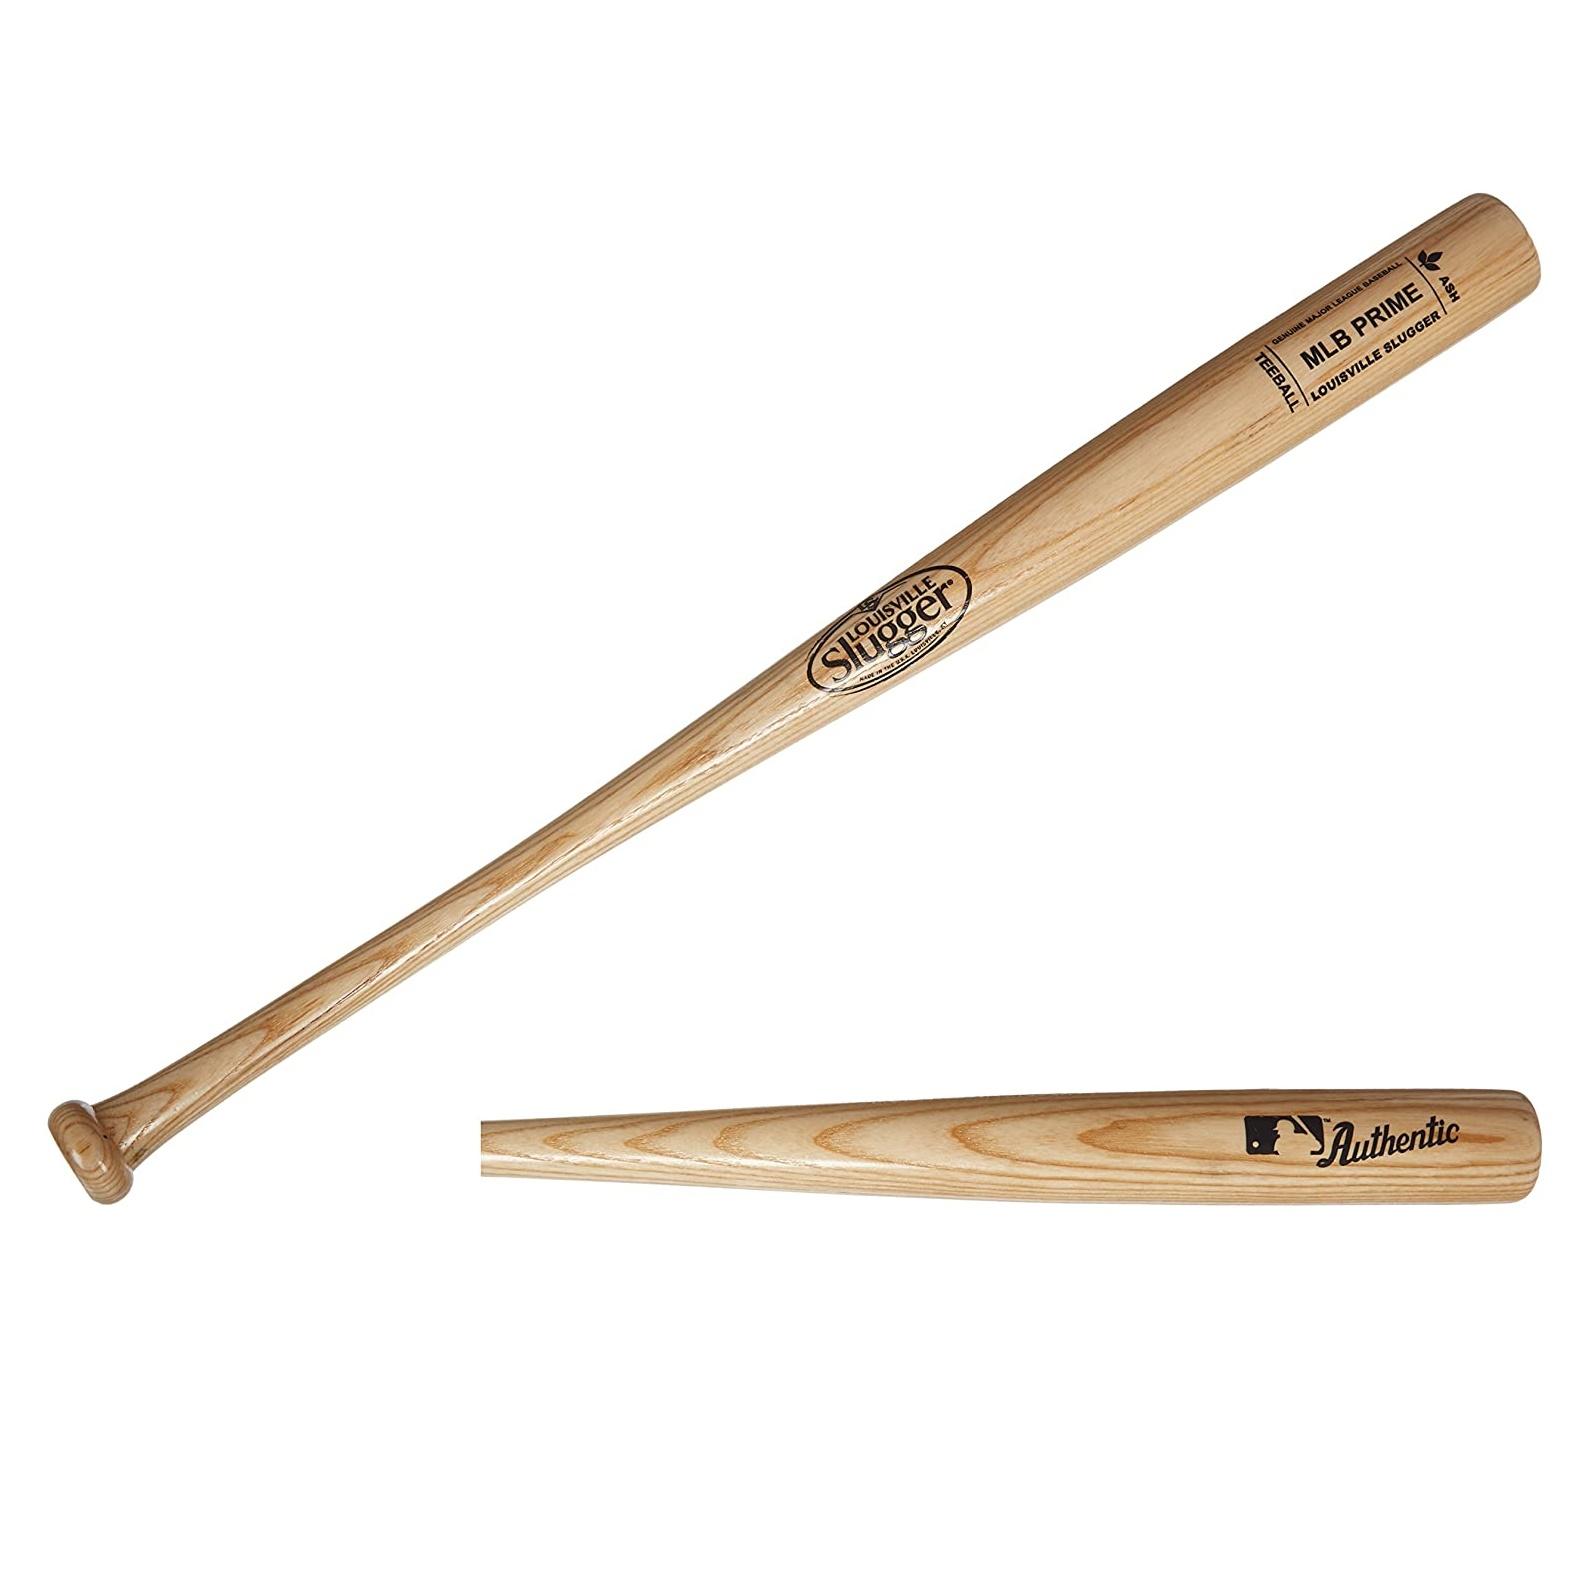 louisville-slugger-wbvaytb-na-125-prime-ash-tee-ball-bat-26-inch WBVAYTB-NA26   <p>Youth Ash wood. Natural Finish Wood Bat and not Cupped.</p>